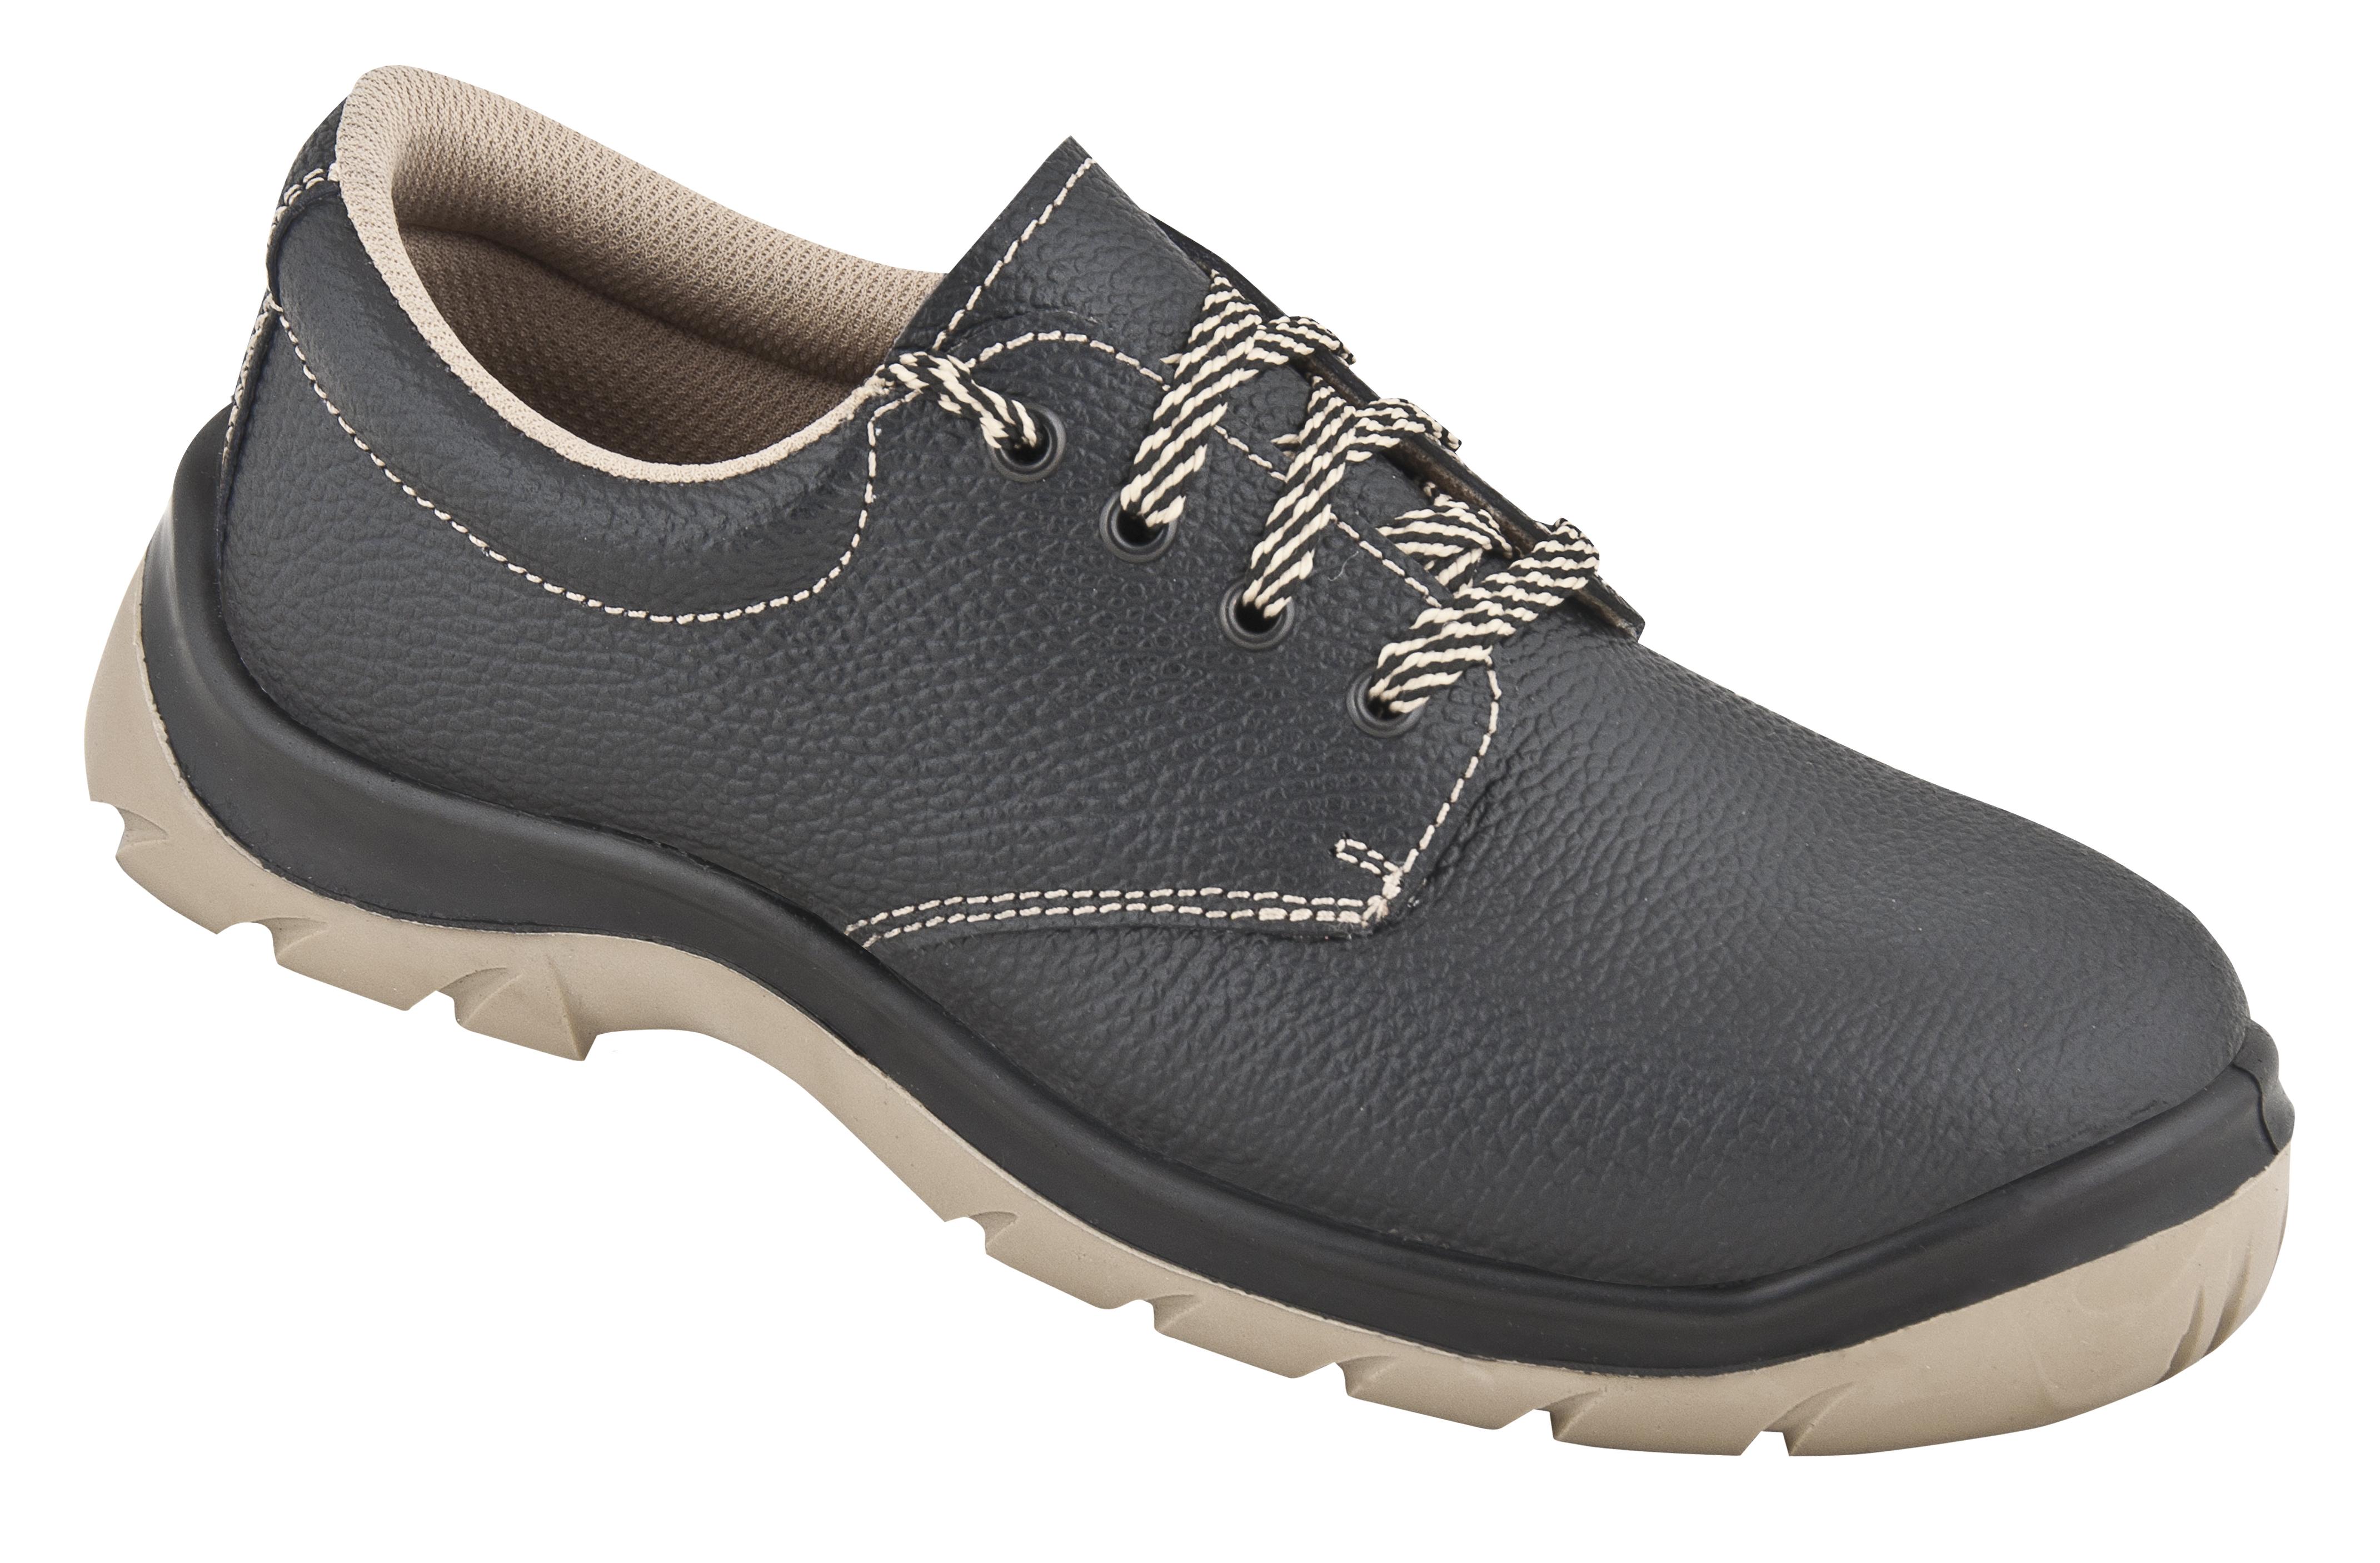 Zaštitna cipela PRIME S1P kompozit niska